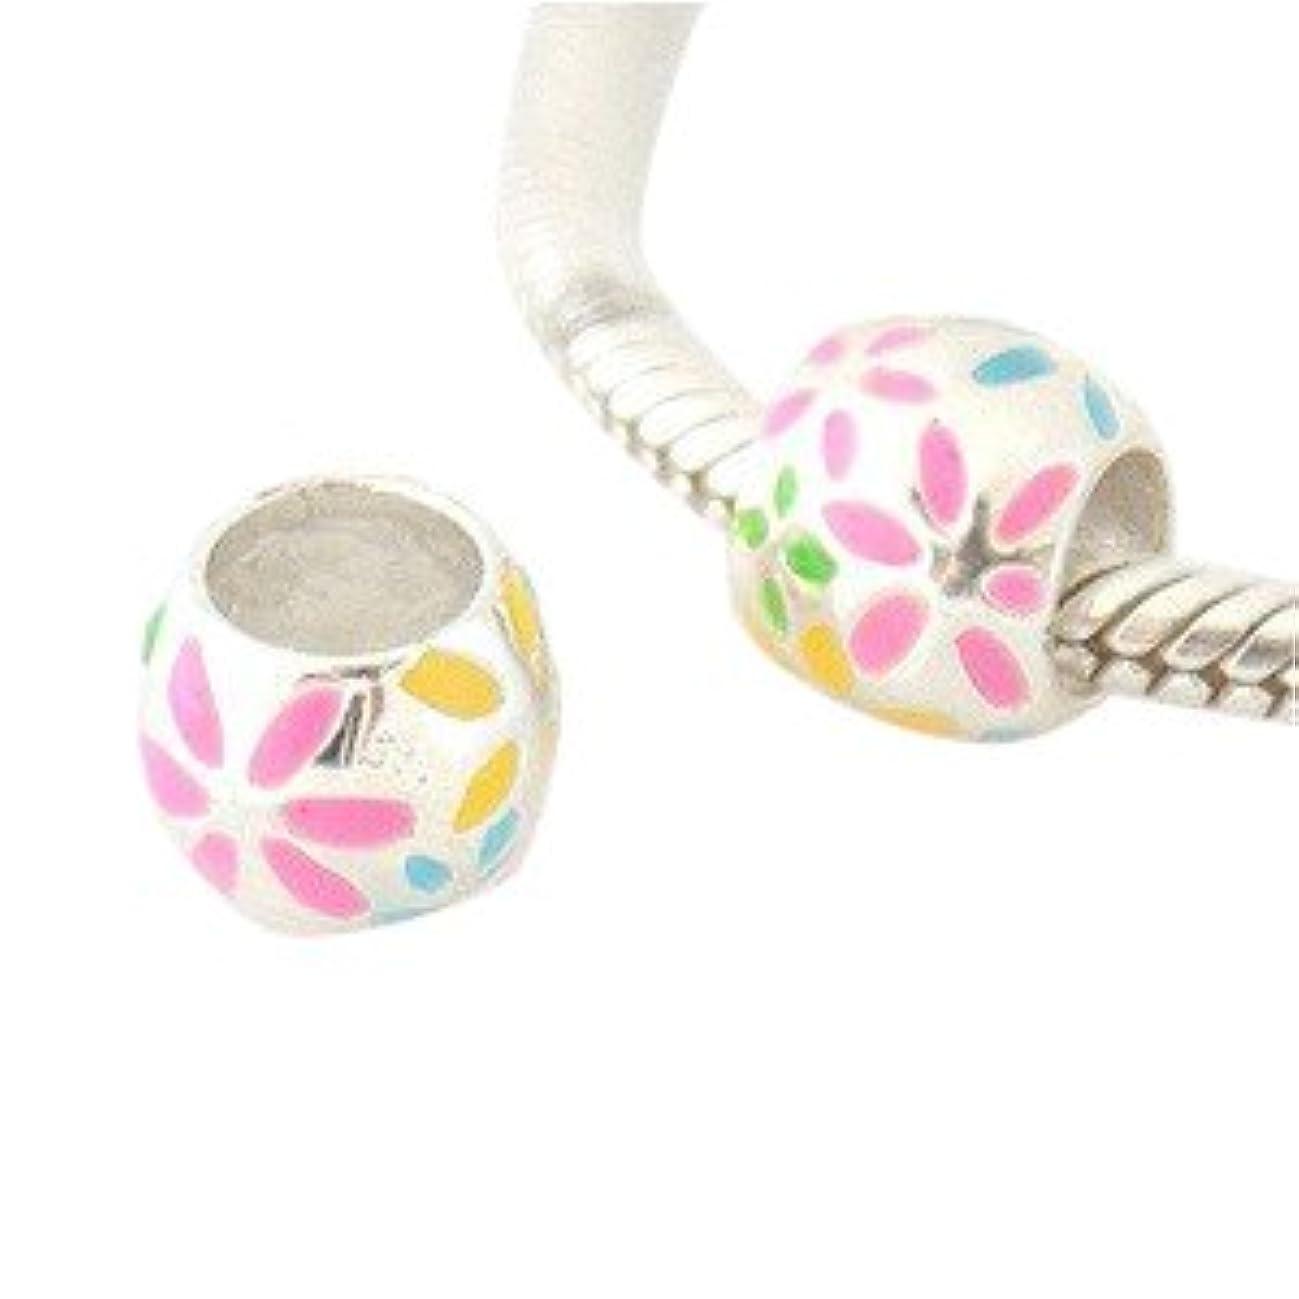 Enamal Painted Flower Ball .925 Sterling Silver Bead Charm Pandora, Chamilia, Biagi & European 3mm Chain Bracelets Compatible.